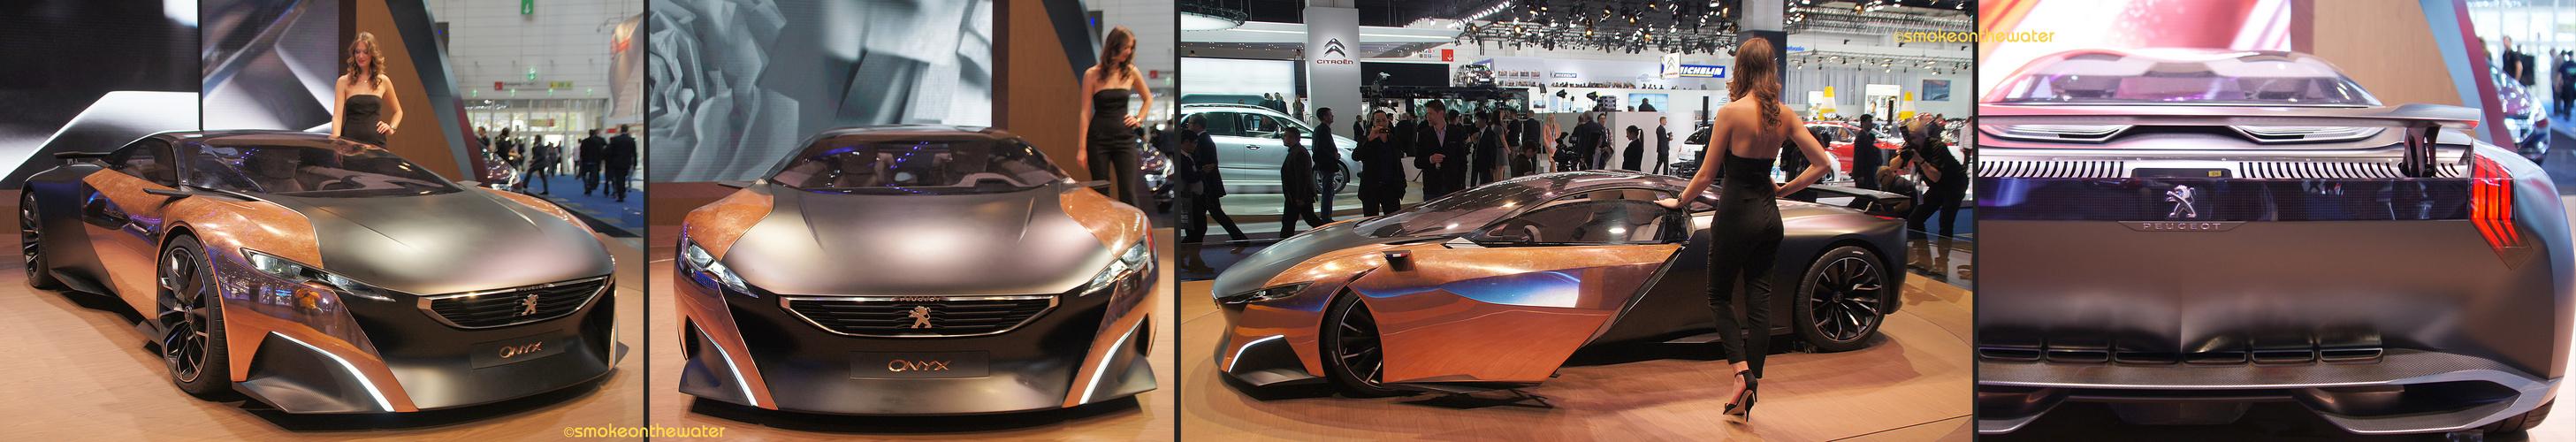 Peugeot Onyx Diesel Hybrid Concept (1)